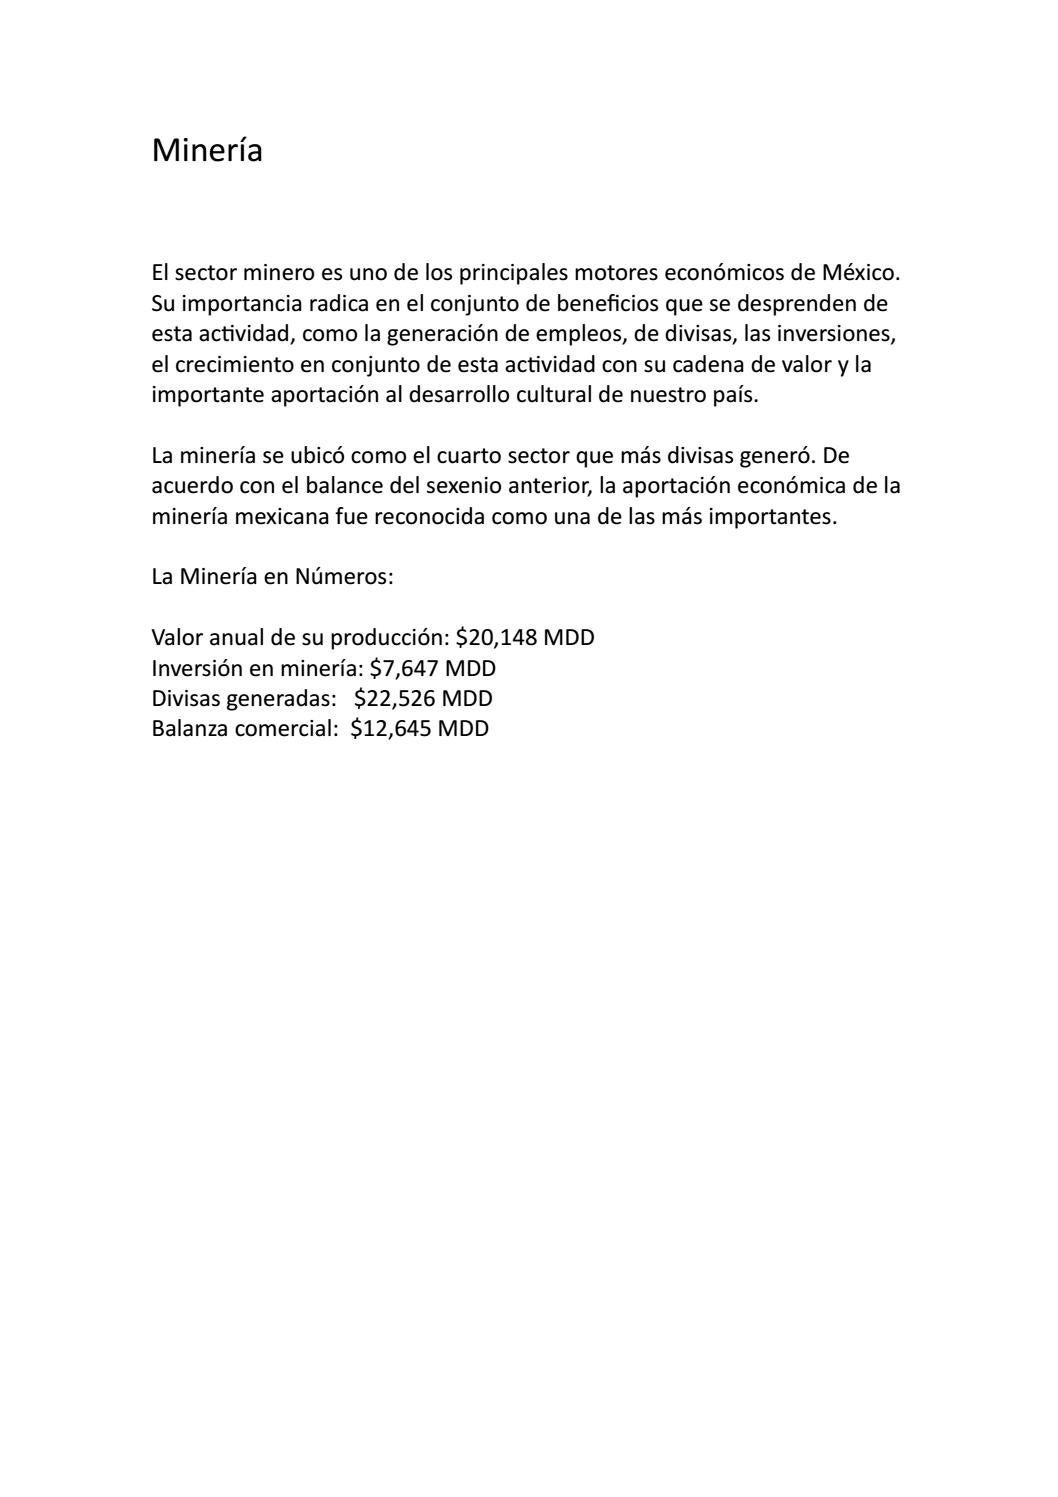 Historia de la Industria Minera en México by ferchogoni - issuu